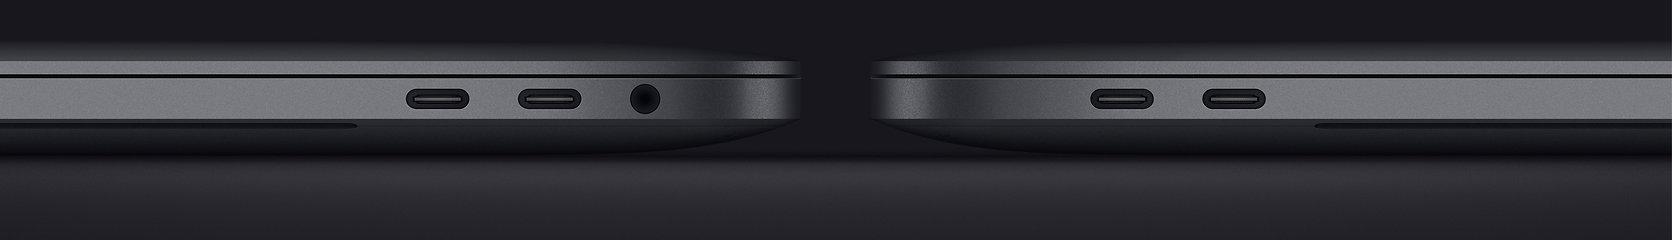 MacBook Pro 13 v14.jpg